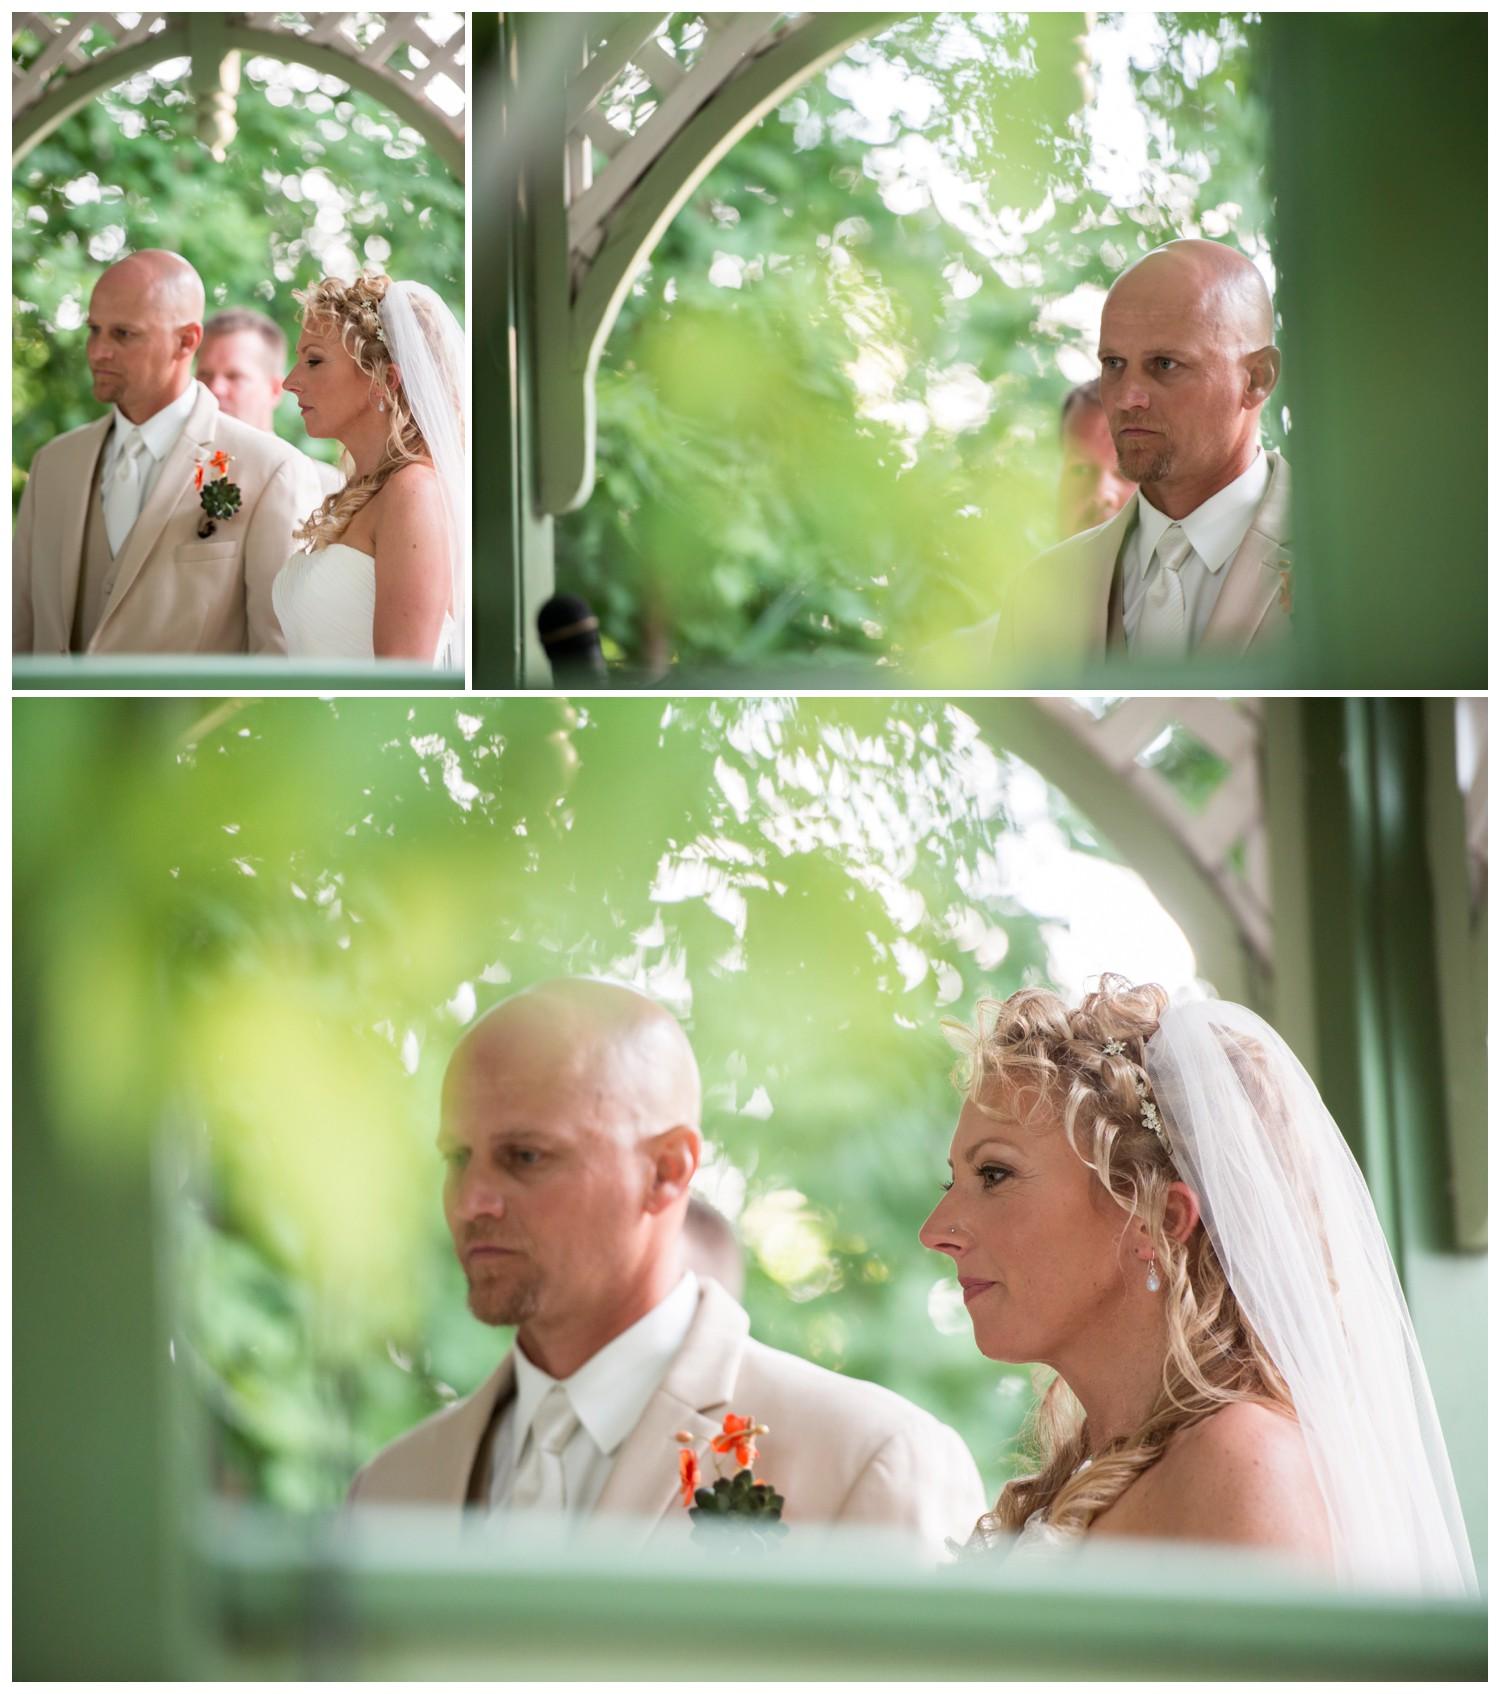 Morningside-manor-colorado-outdoor-wedding-photography_0032.jpg